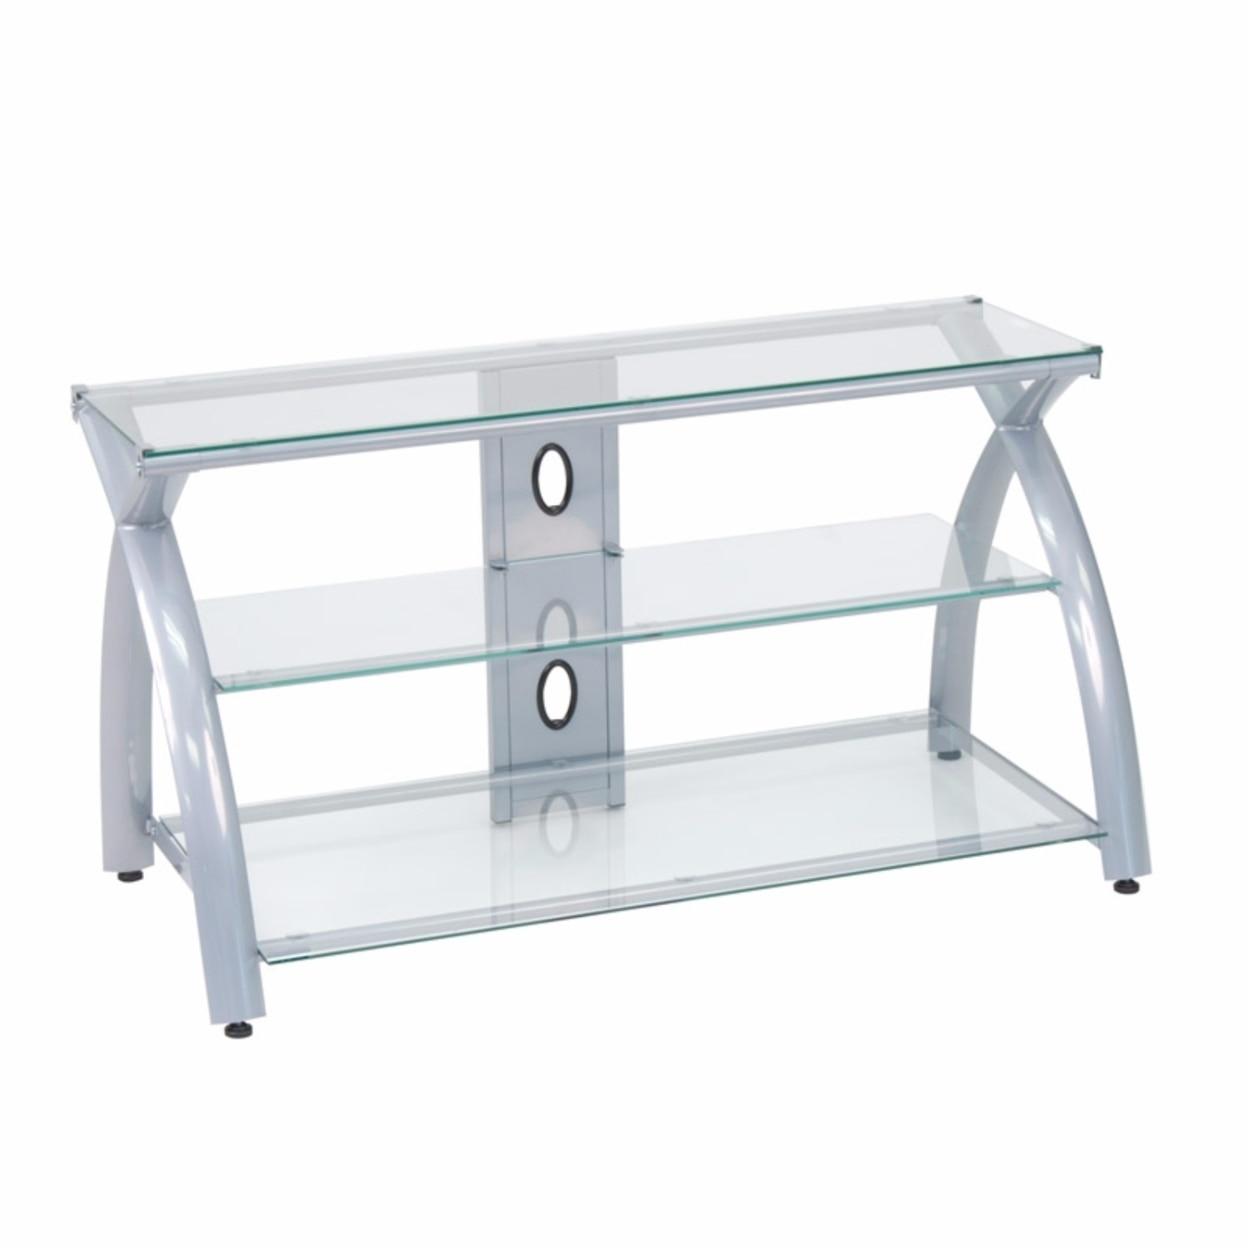 Studio Designs Home Office Futura TV Stand Glass - Silver/Clear